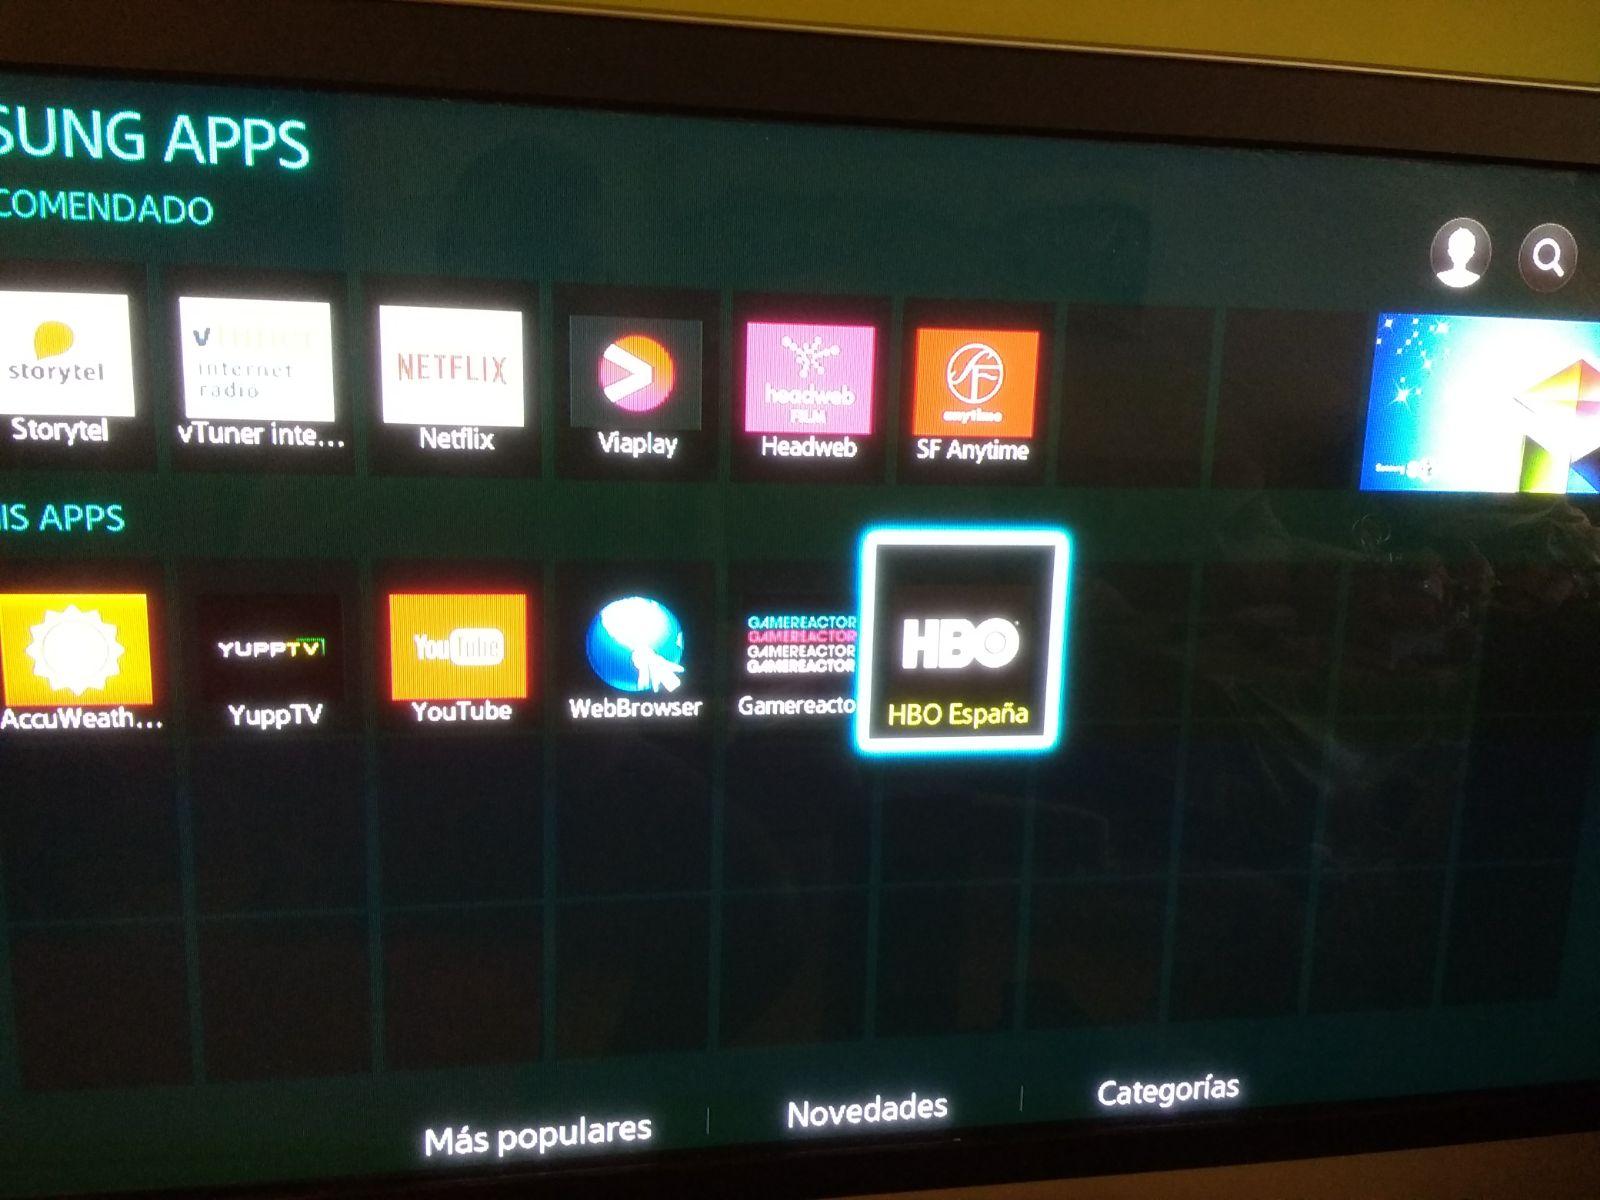 hbo go samsung smart tv app